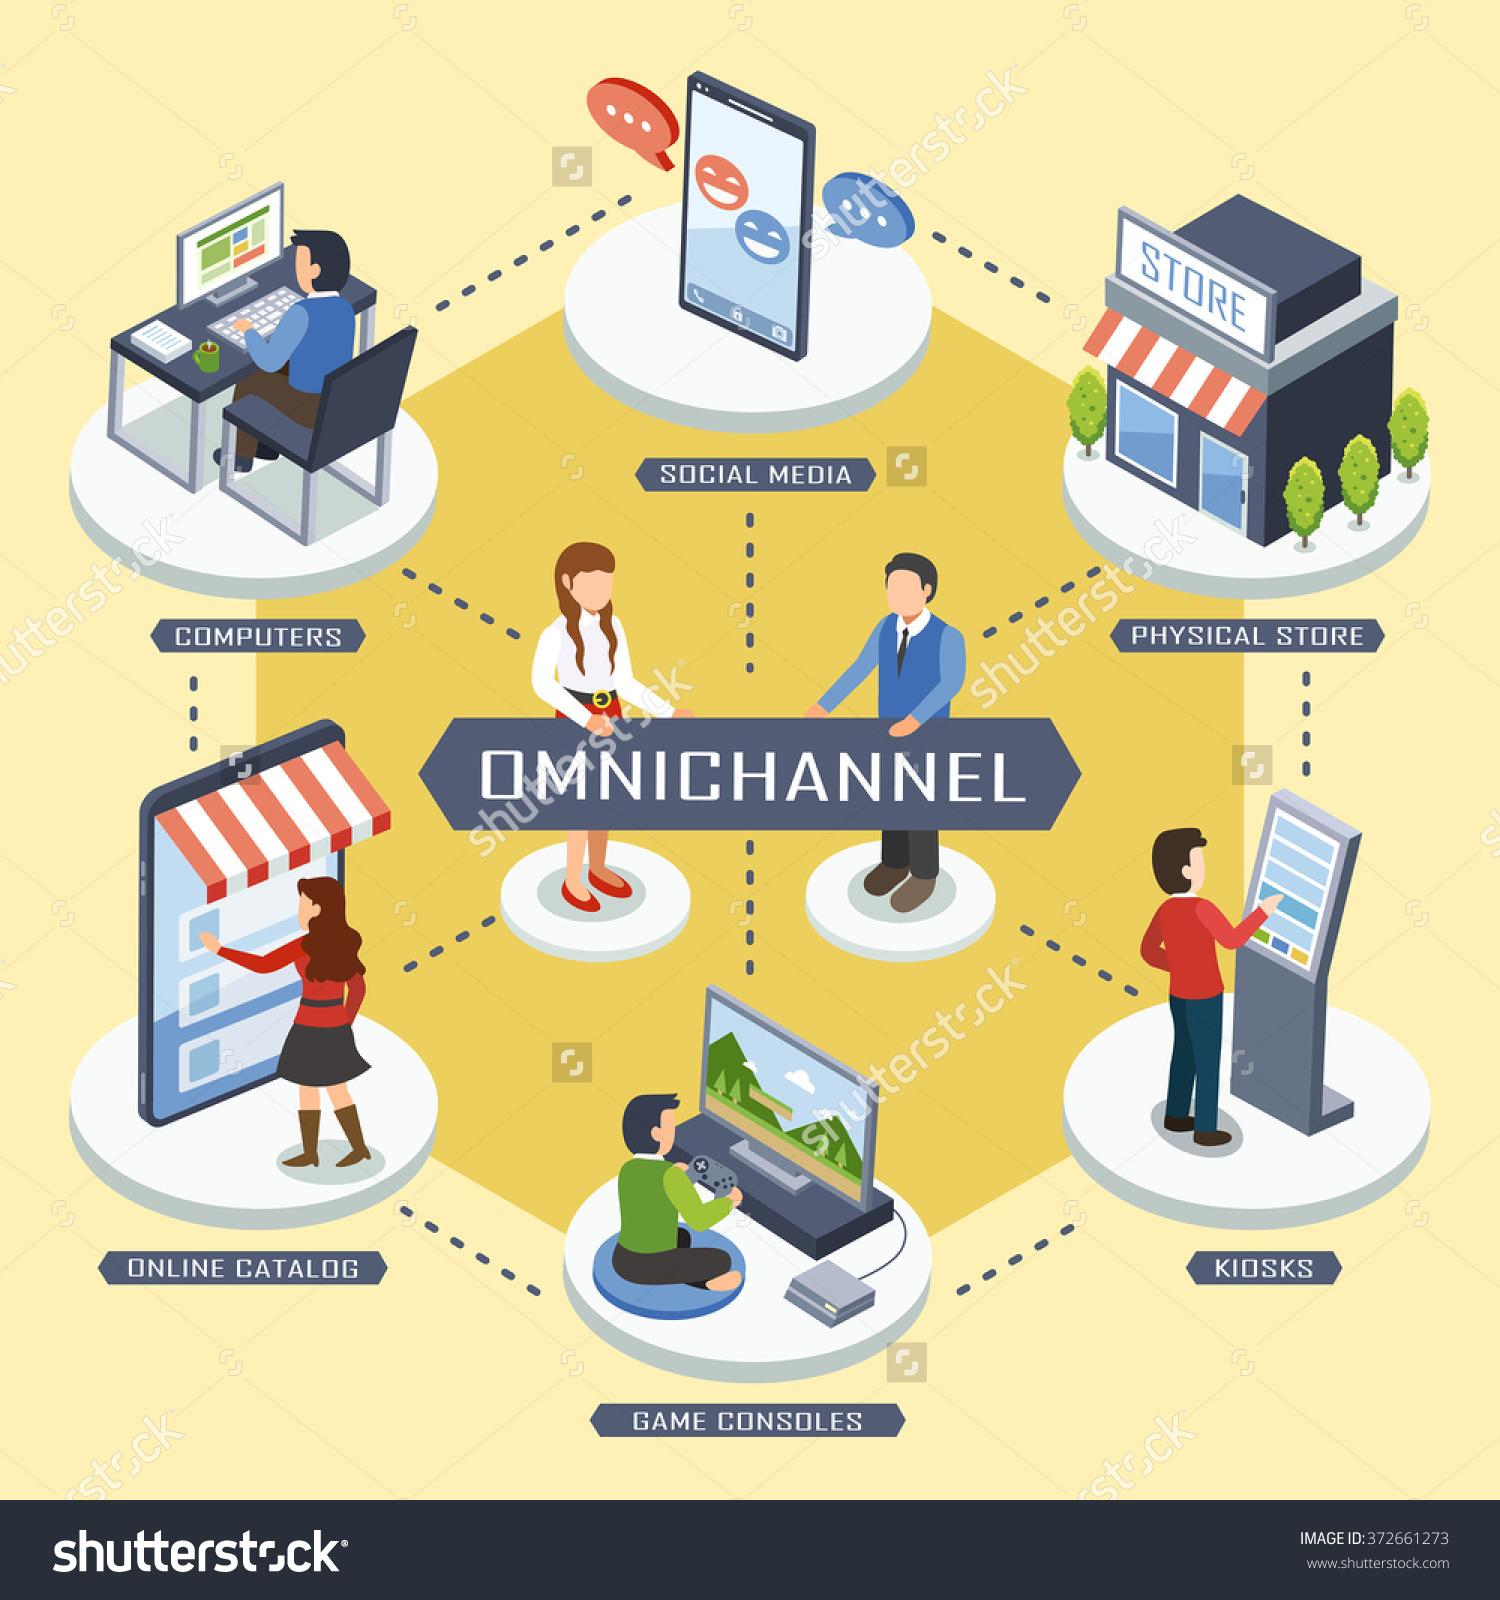 Omnichannel Marketing Concept Flat Design Stock Vector 372661273.